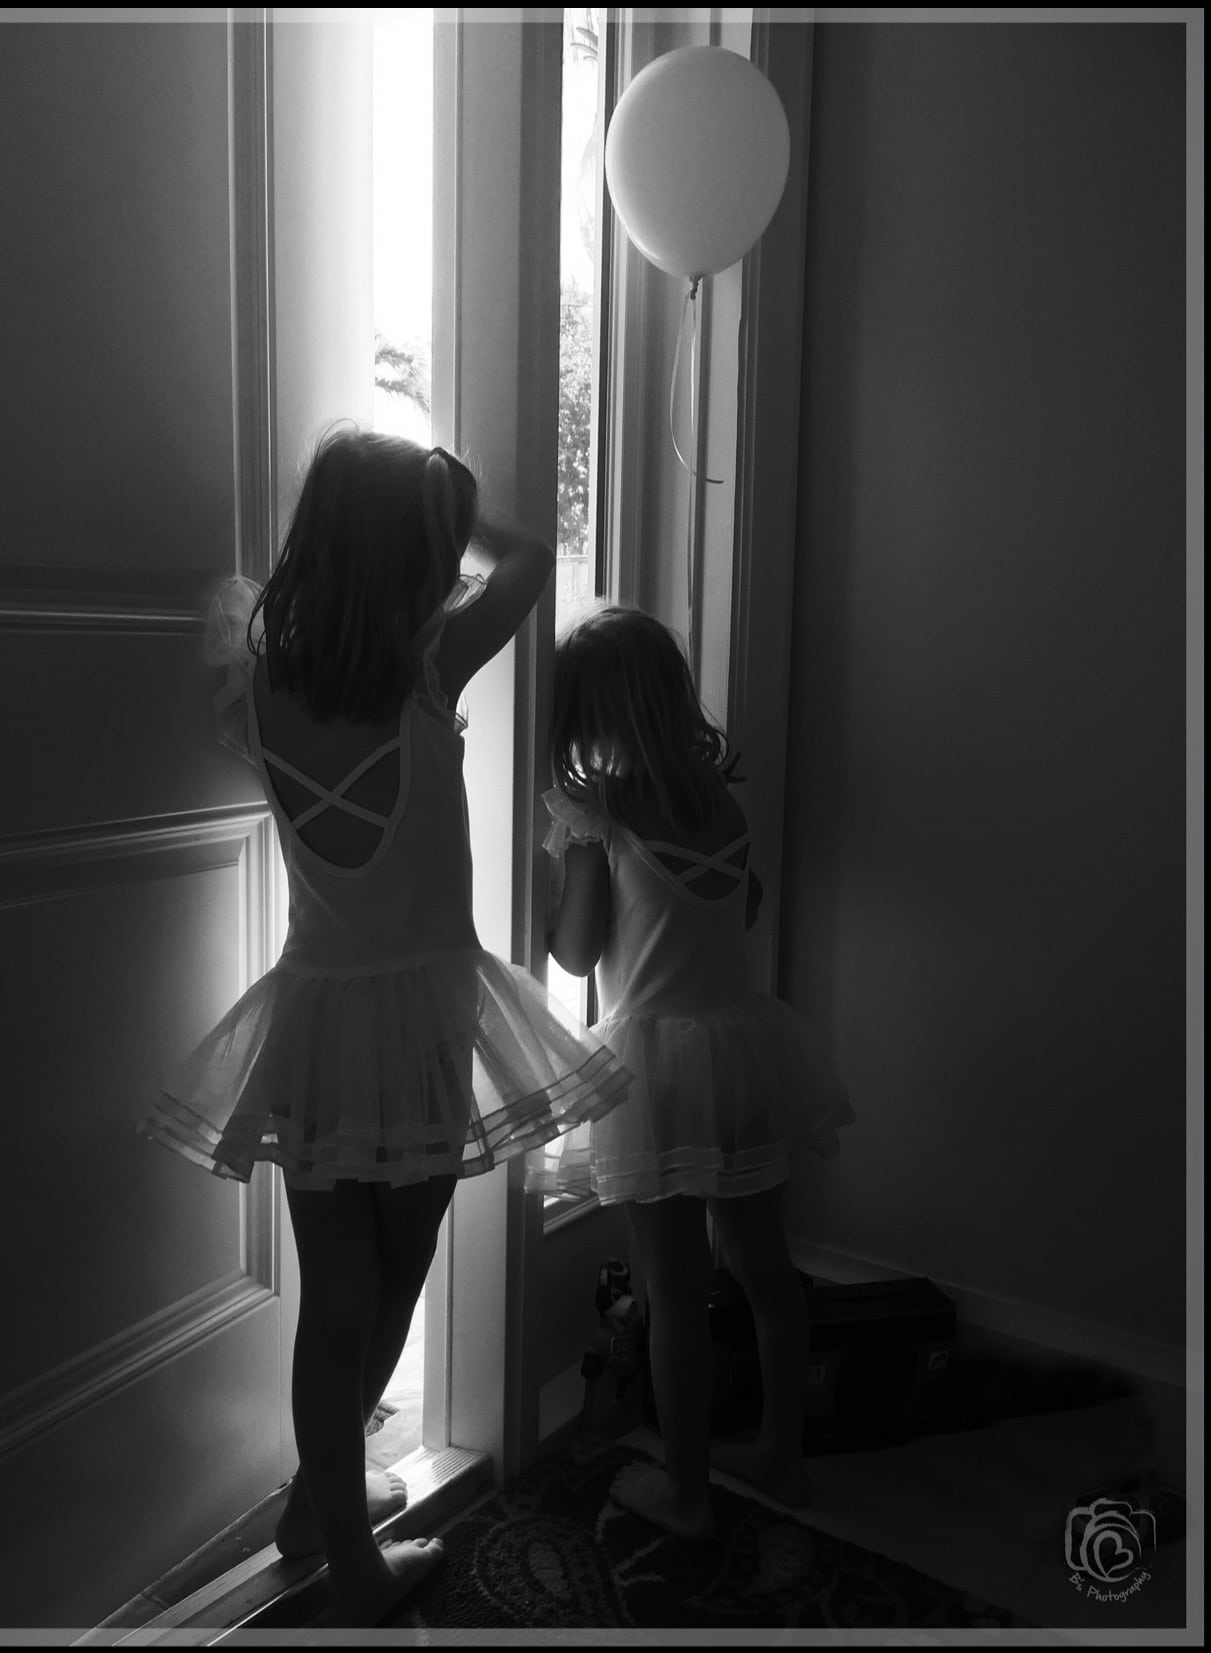 BeAtriZ pAdiLLa_Ballerinas